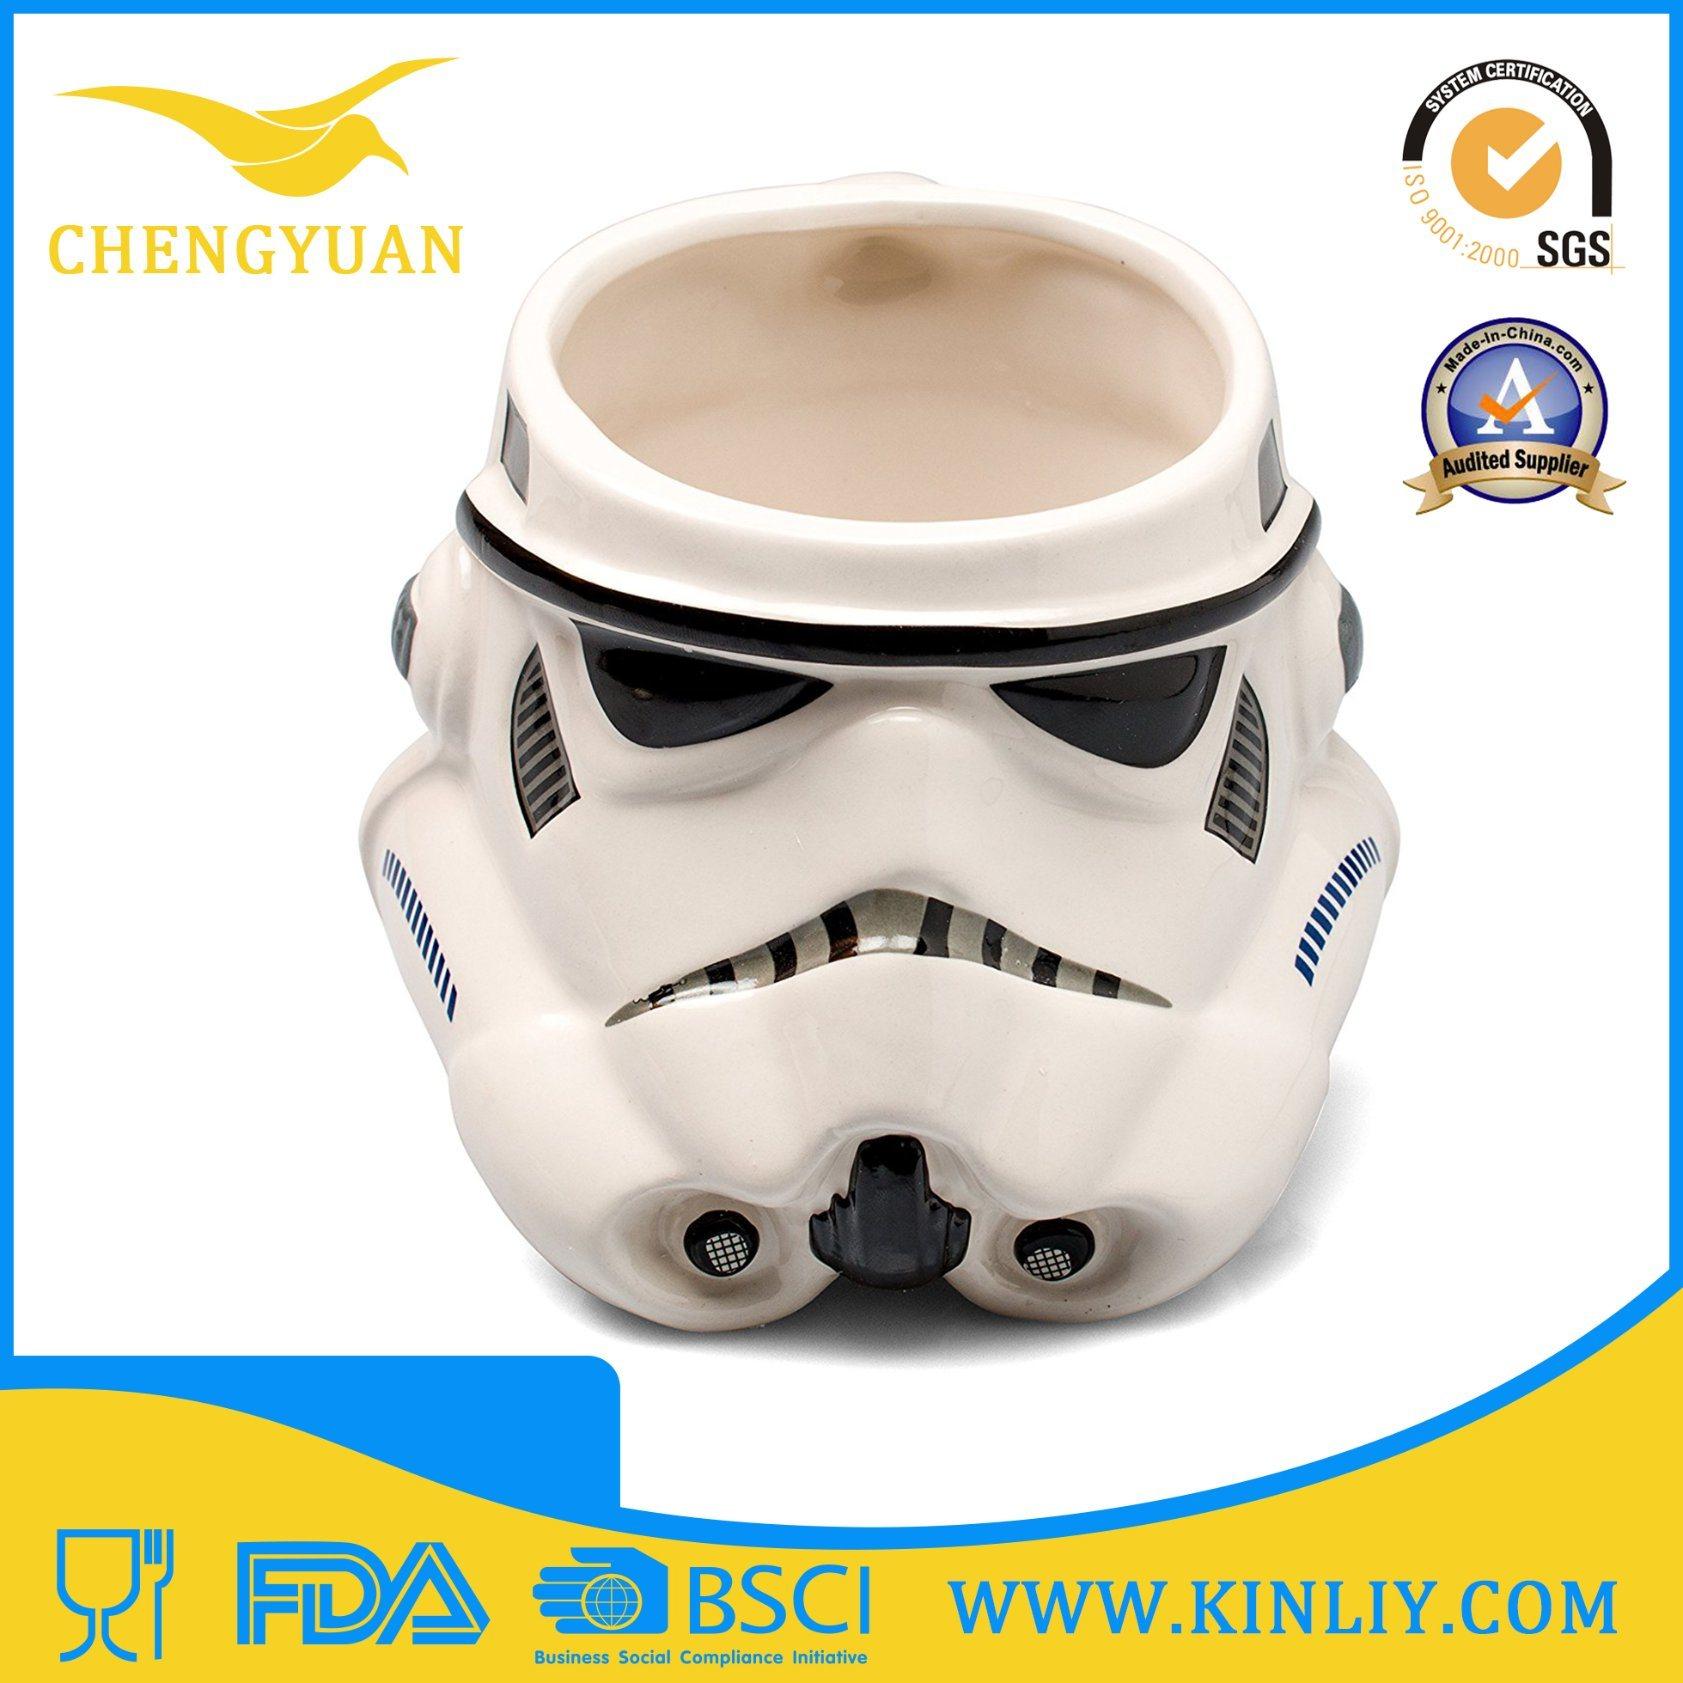 Mighty Ceramic Star Wars Tea Cup Coffee Mug with Lid